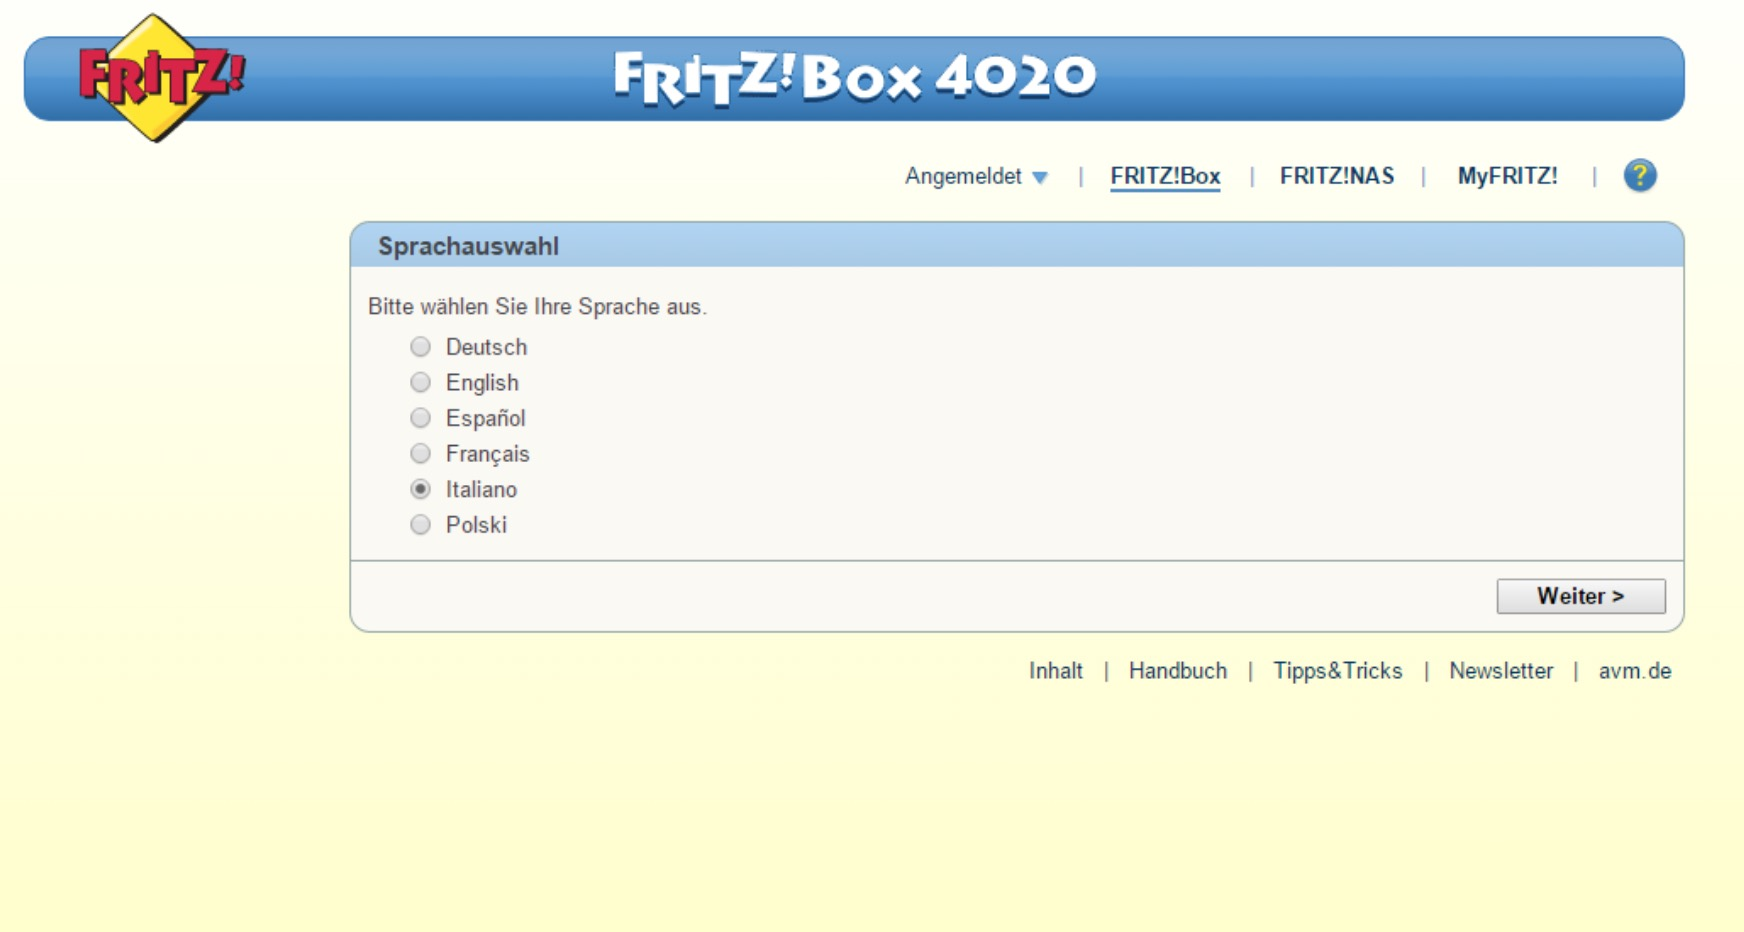 FRITZ!OS sistema operativo FRITZ!Box 4020